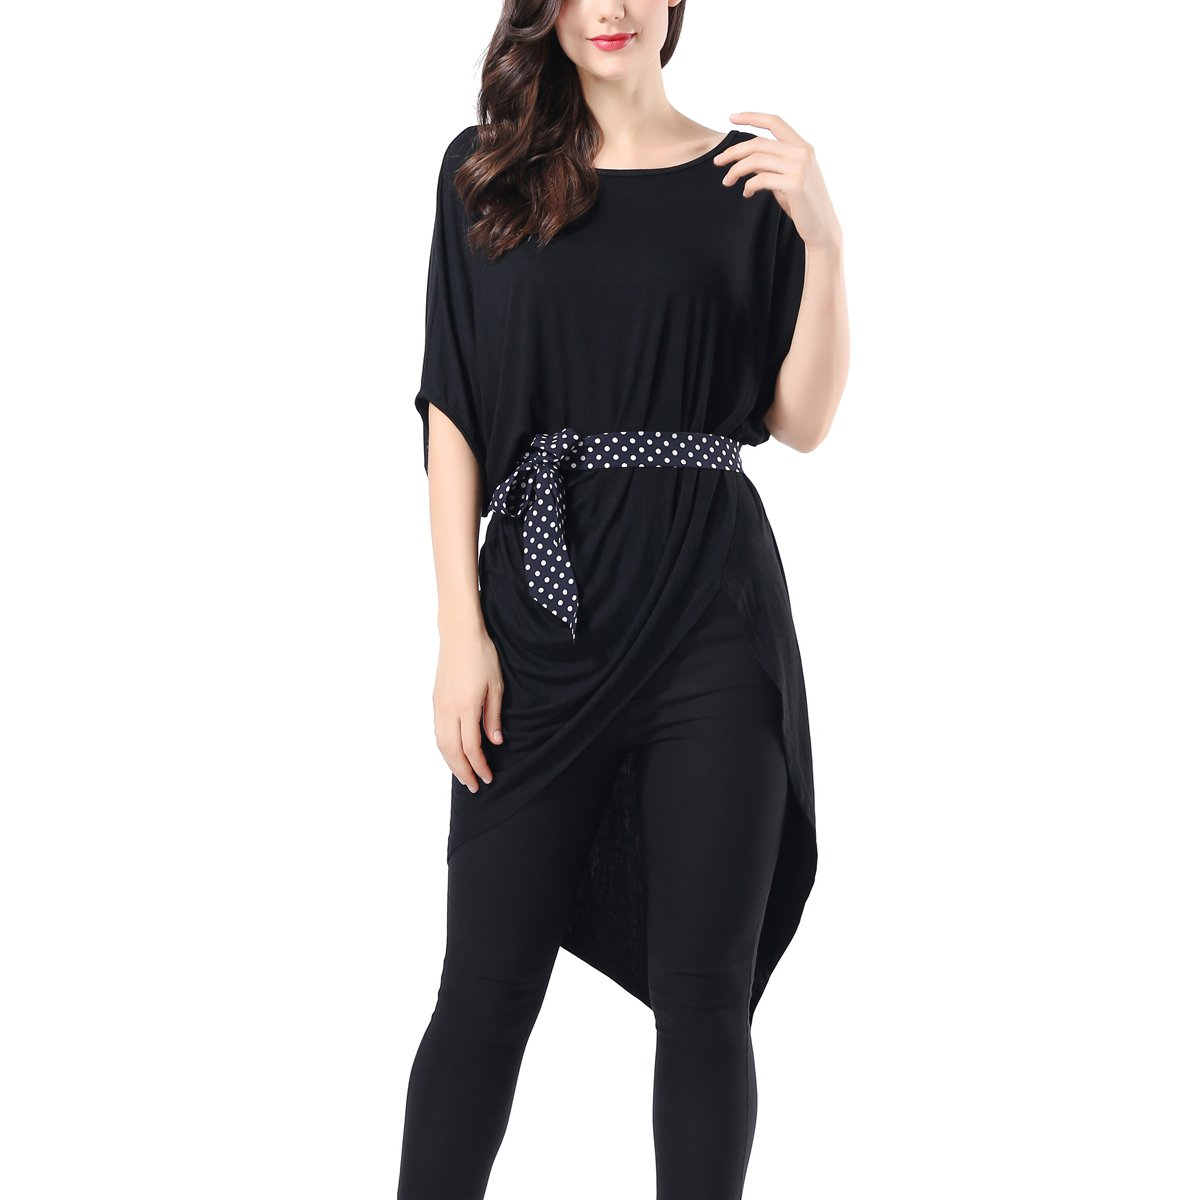 43672b75488 Top1  AVTOSRNO Women High Low Asymmetrical Short Sleeve Bodycon Tops Blouse Shirt  Dress Belted